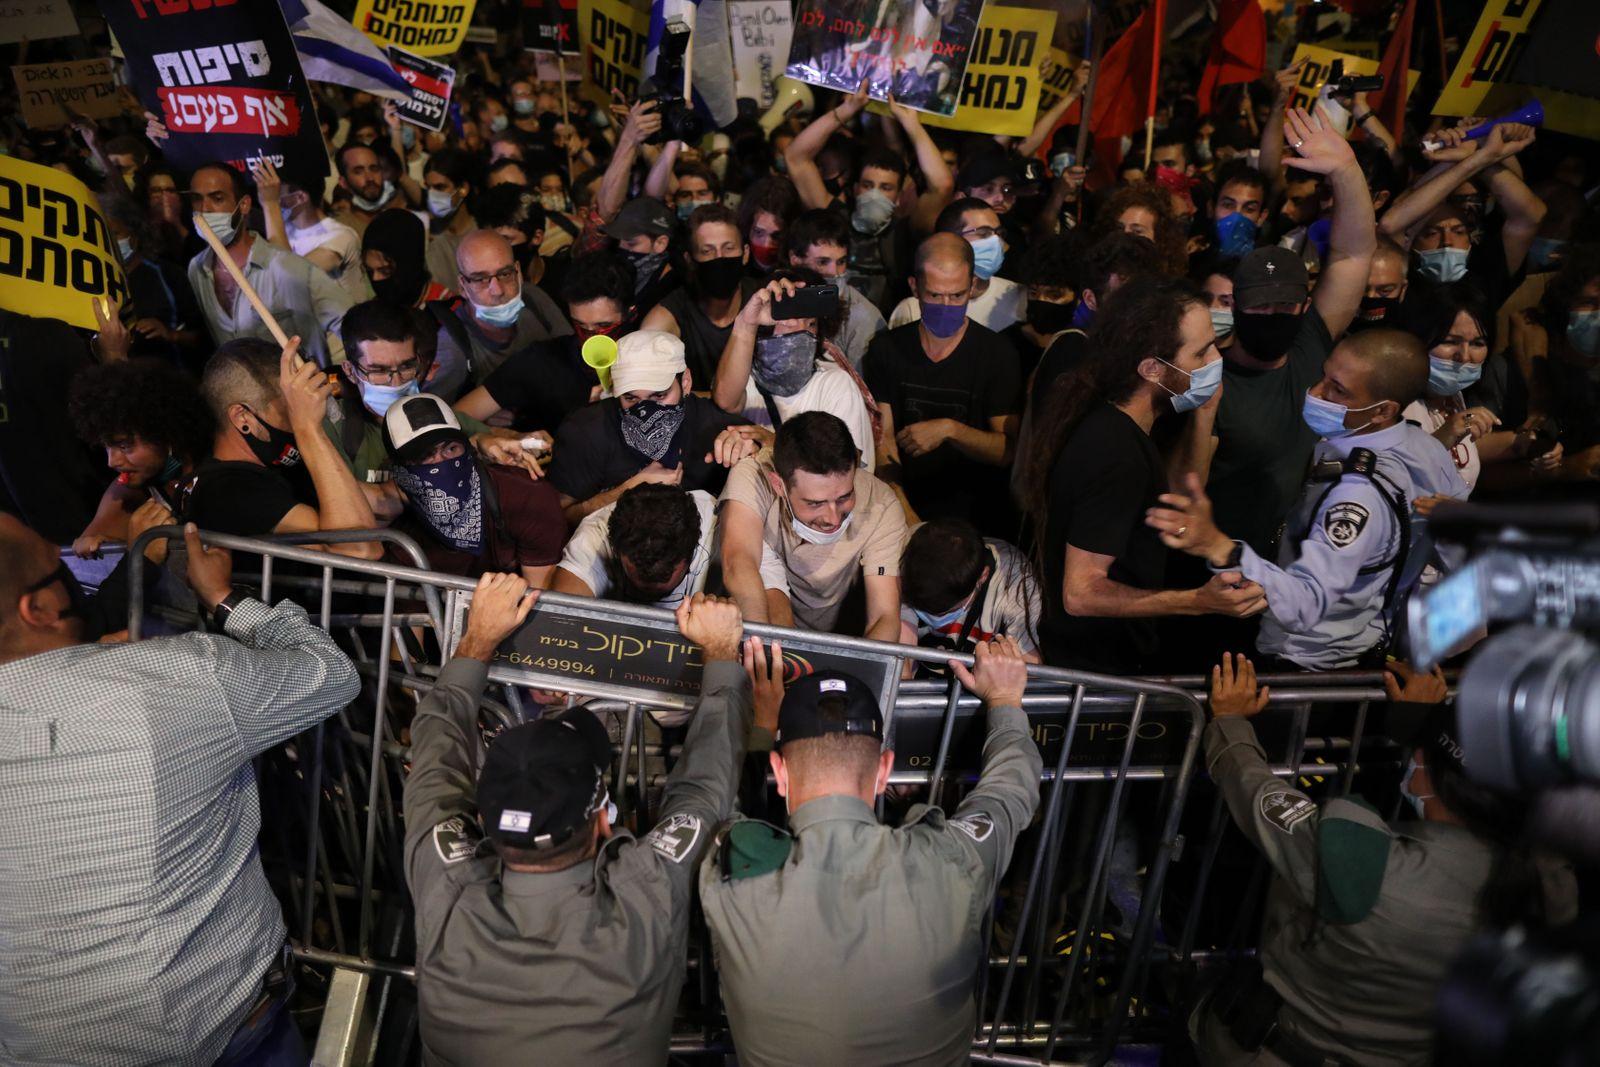 Anti-Netanyahu protest in Jerusalem, Israel - 14 Jul 2020